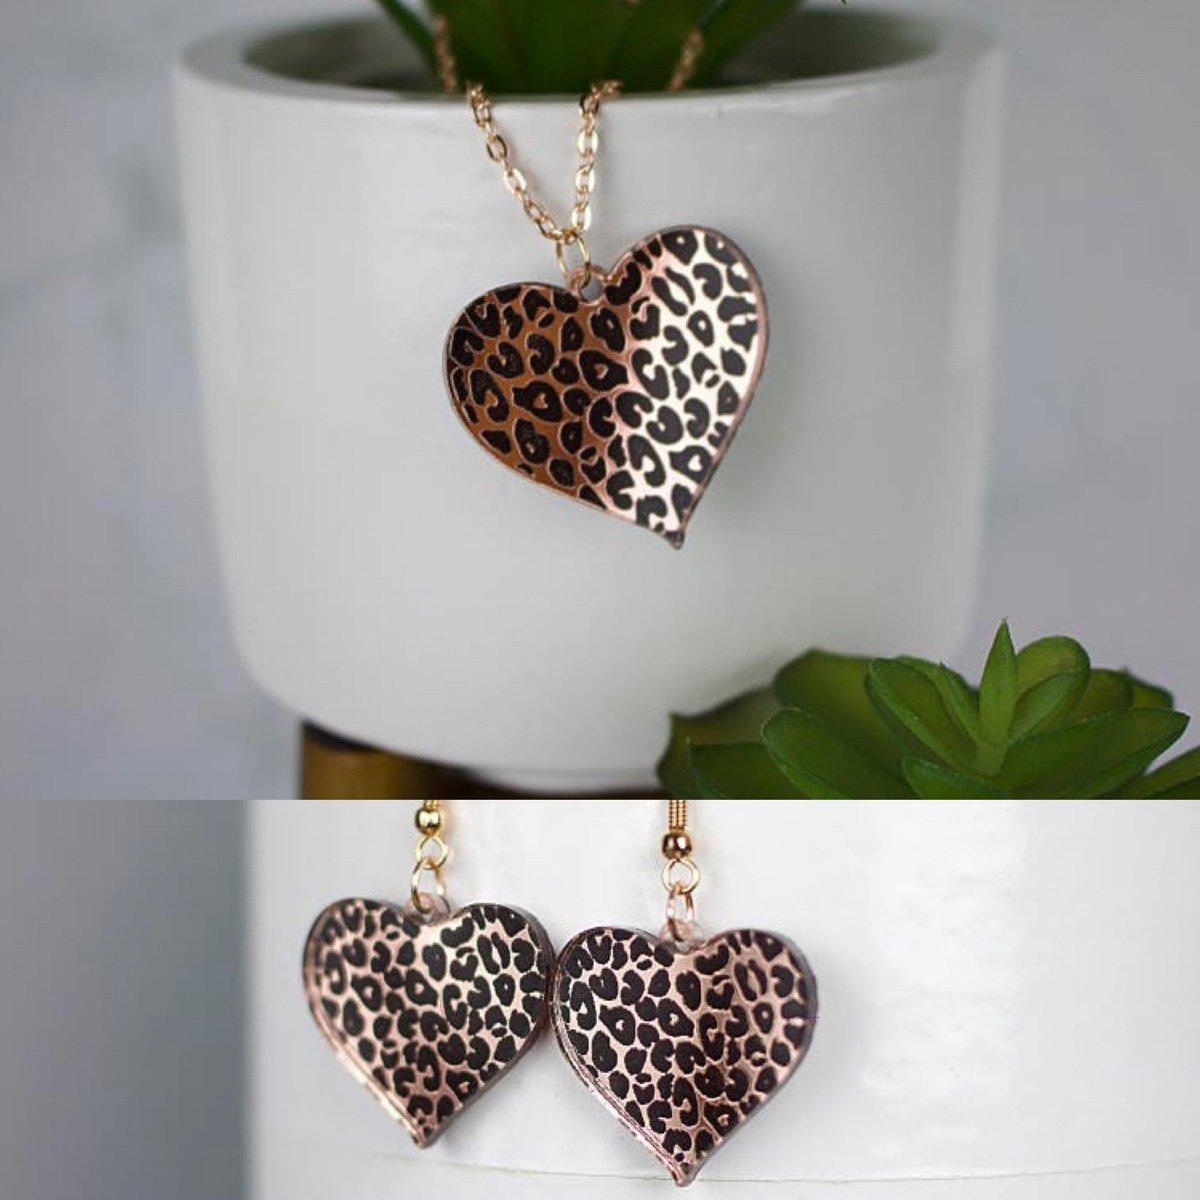 Buy your set here at my Etsy shop: https://t.co/Jtwtj0tpf2 #jewellery #unique #leopardprint #foryou #smallbiz #inthebiz https://t.co/JoqKpy8OAY